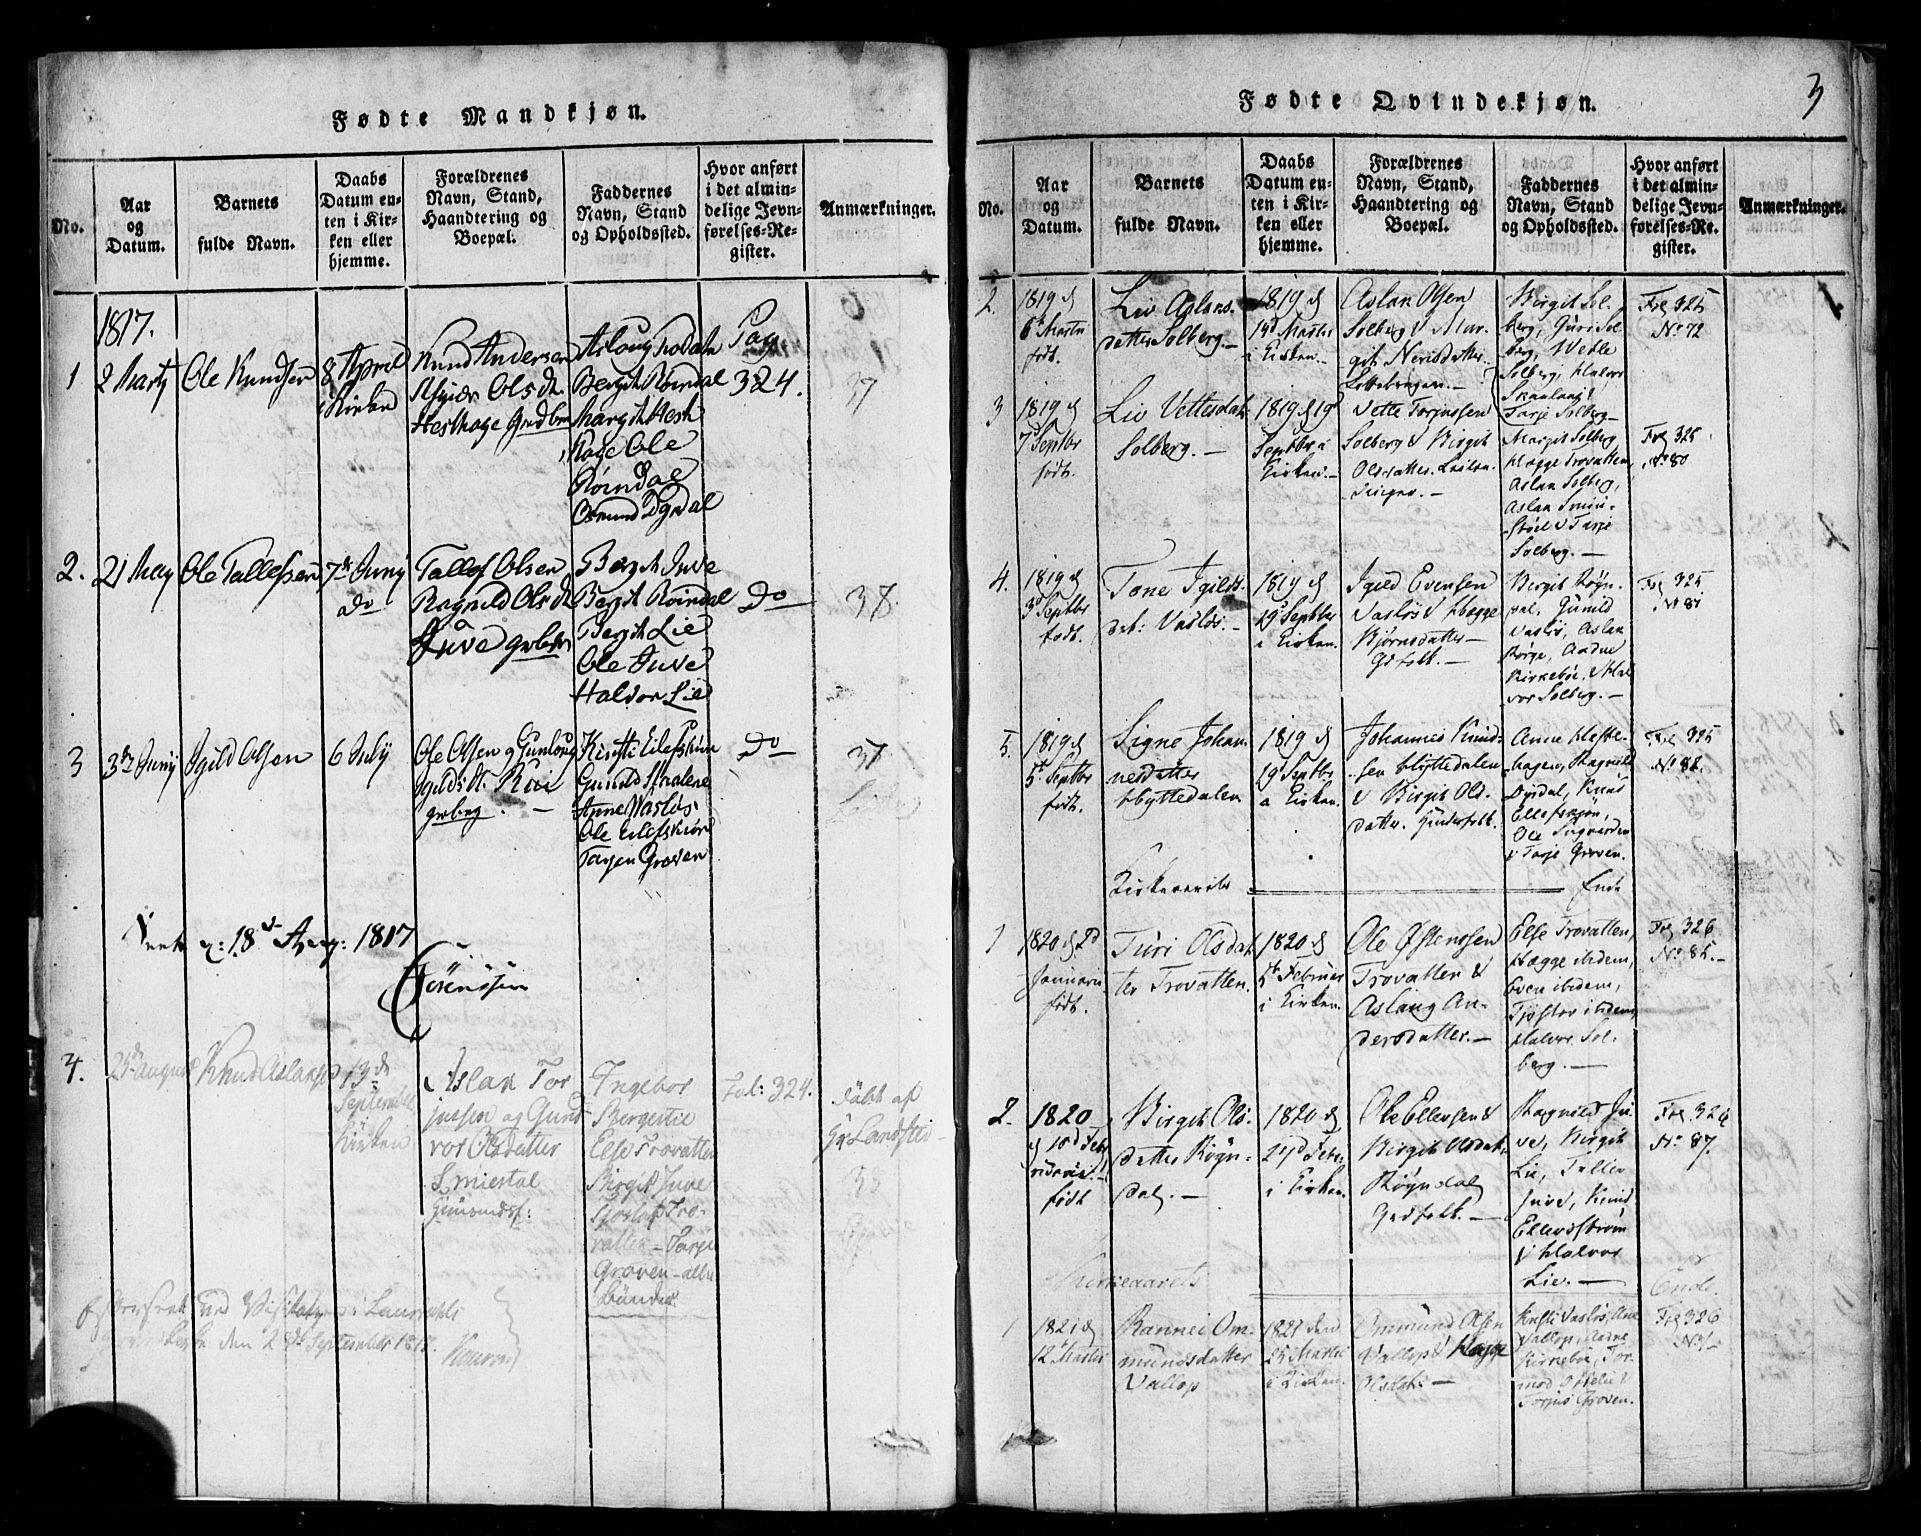 SAKO, Rauland kirkebøker, F/Fa/L0002: Ministerialbok nr. 2, 1815-1860, s. 3